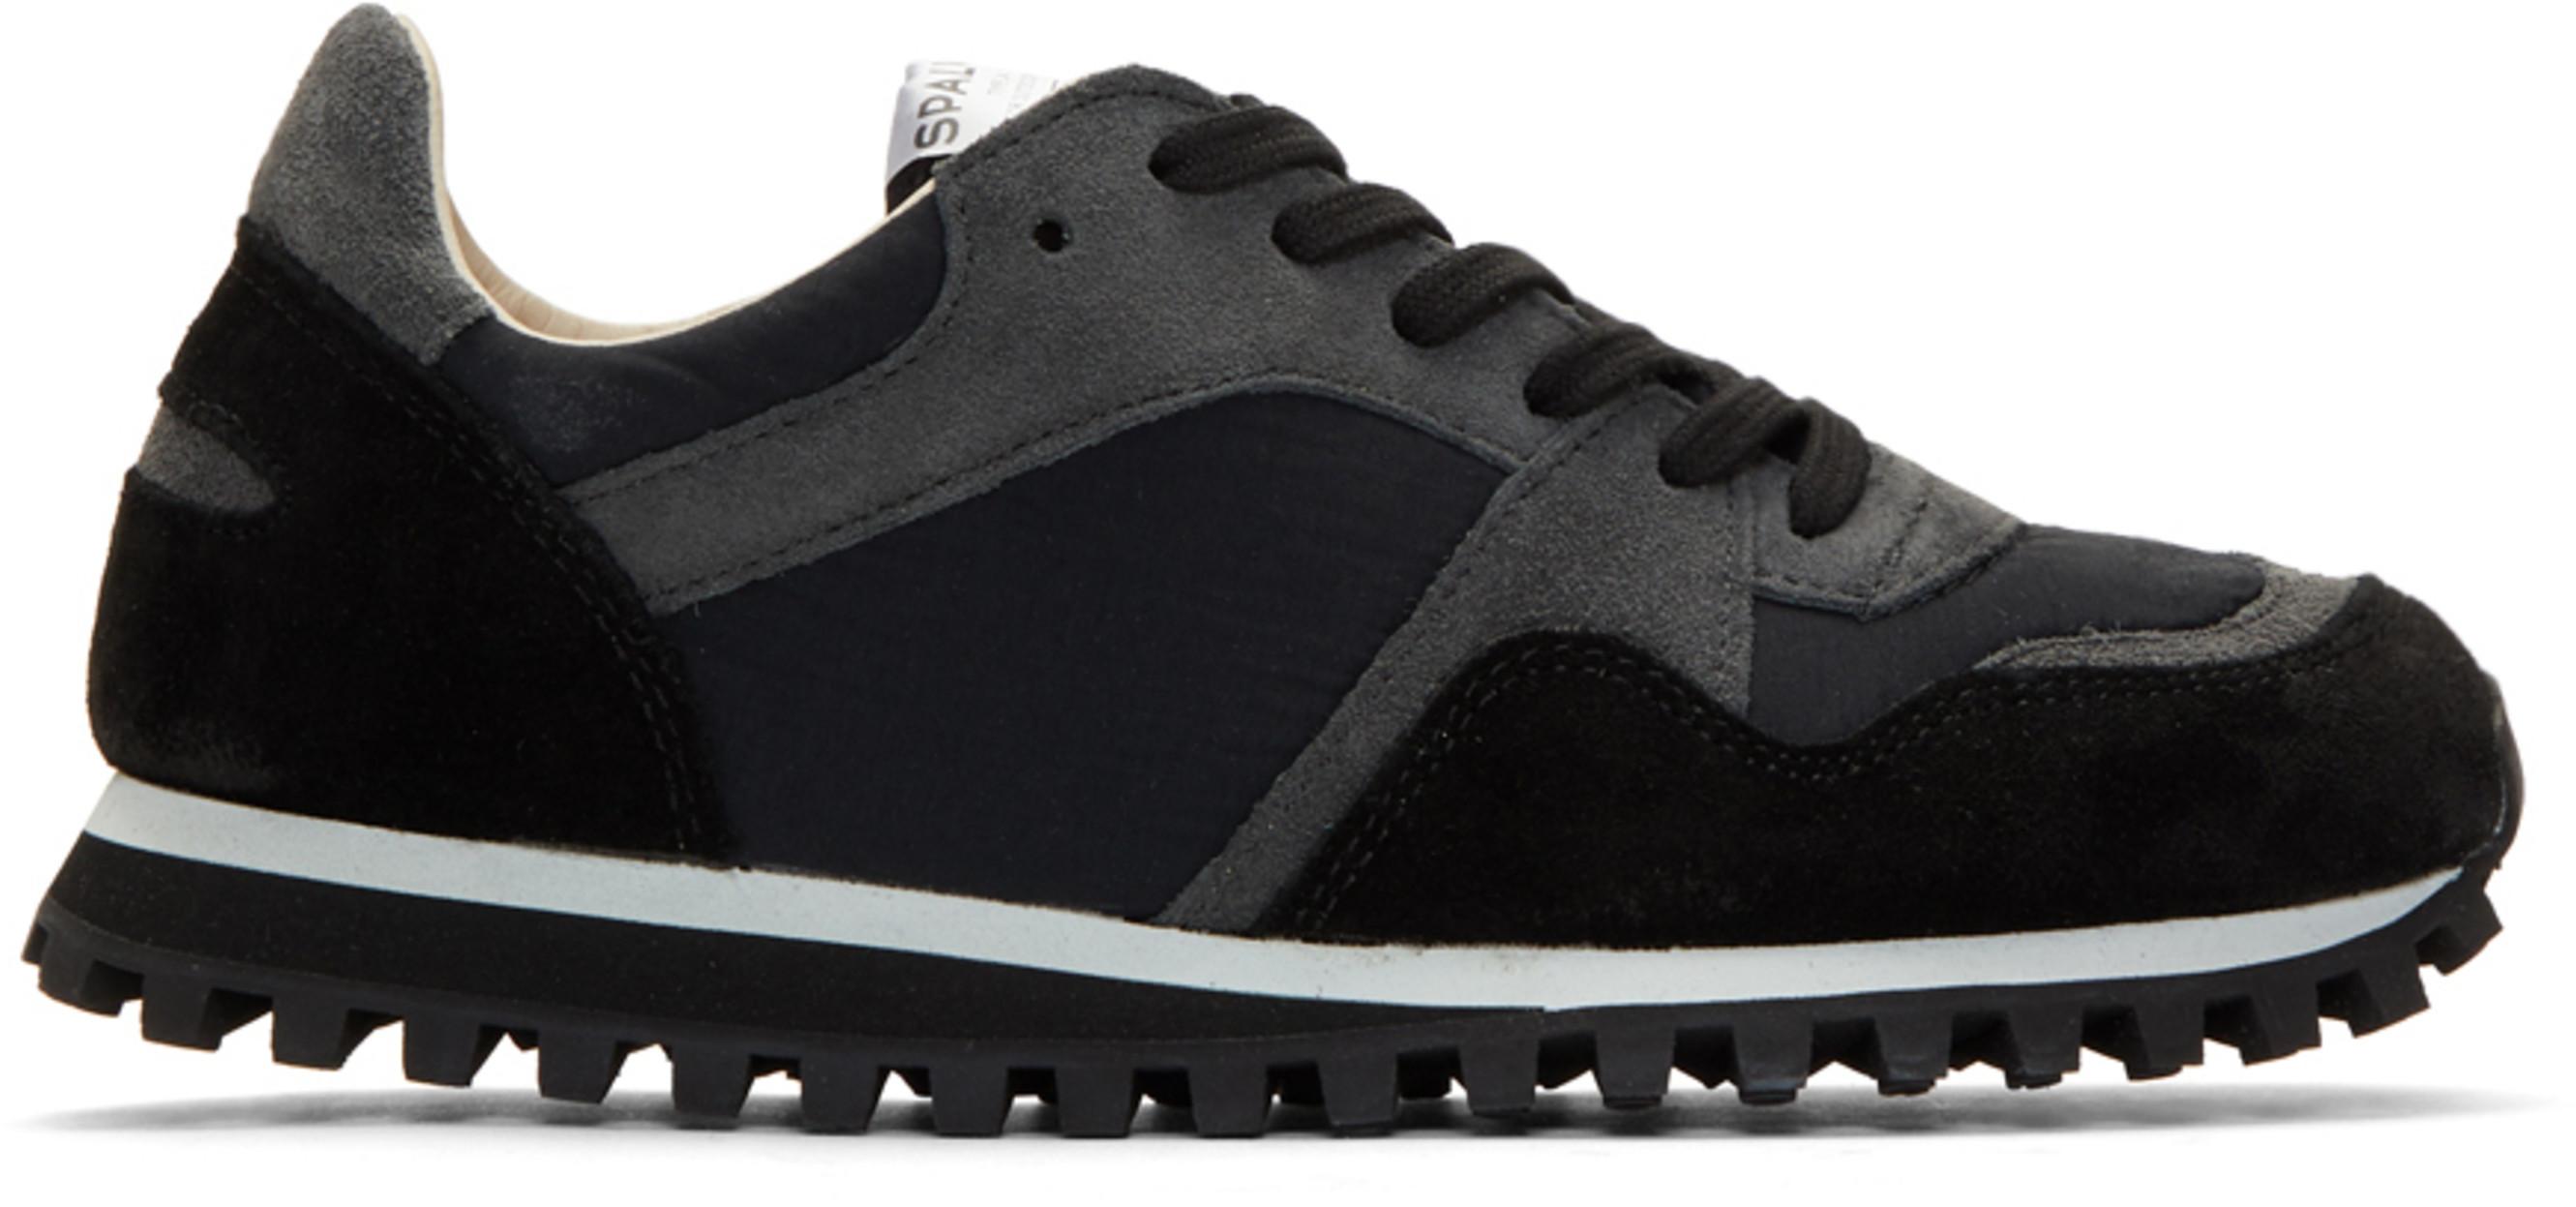 a7e69e3764c Designer sneakers for Women